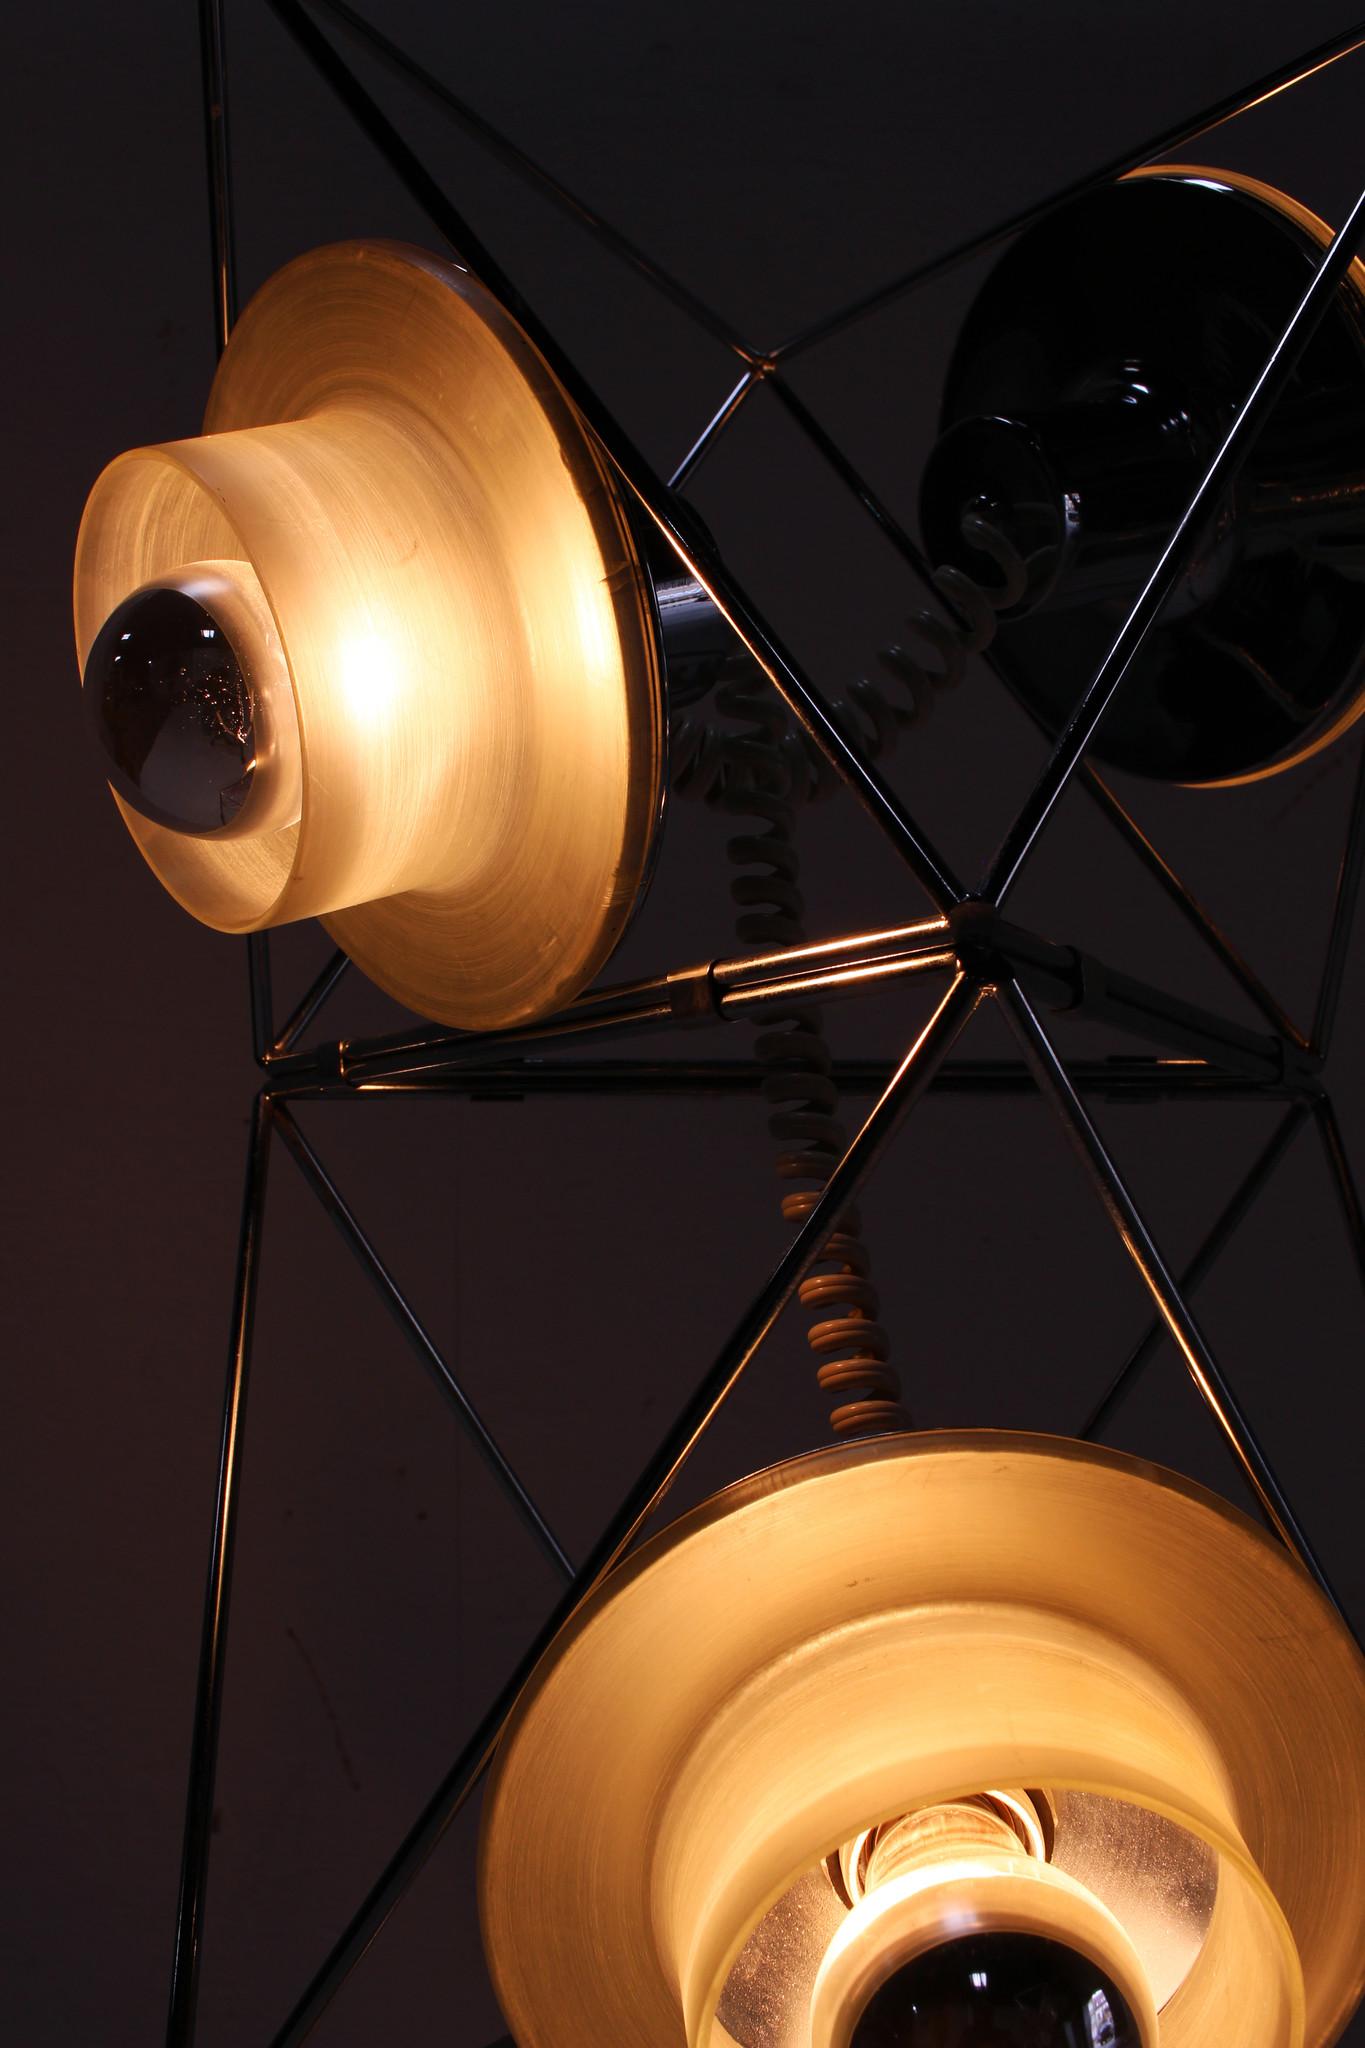 Modular floor lamp by Felice Ragazzo for Guzzini 1969